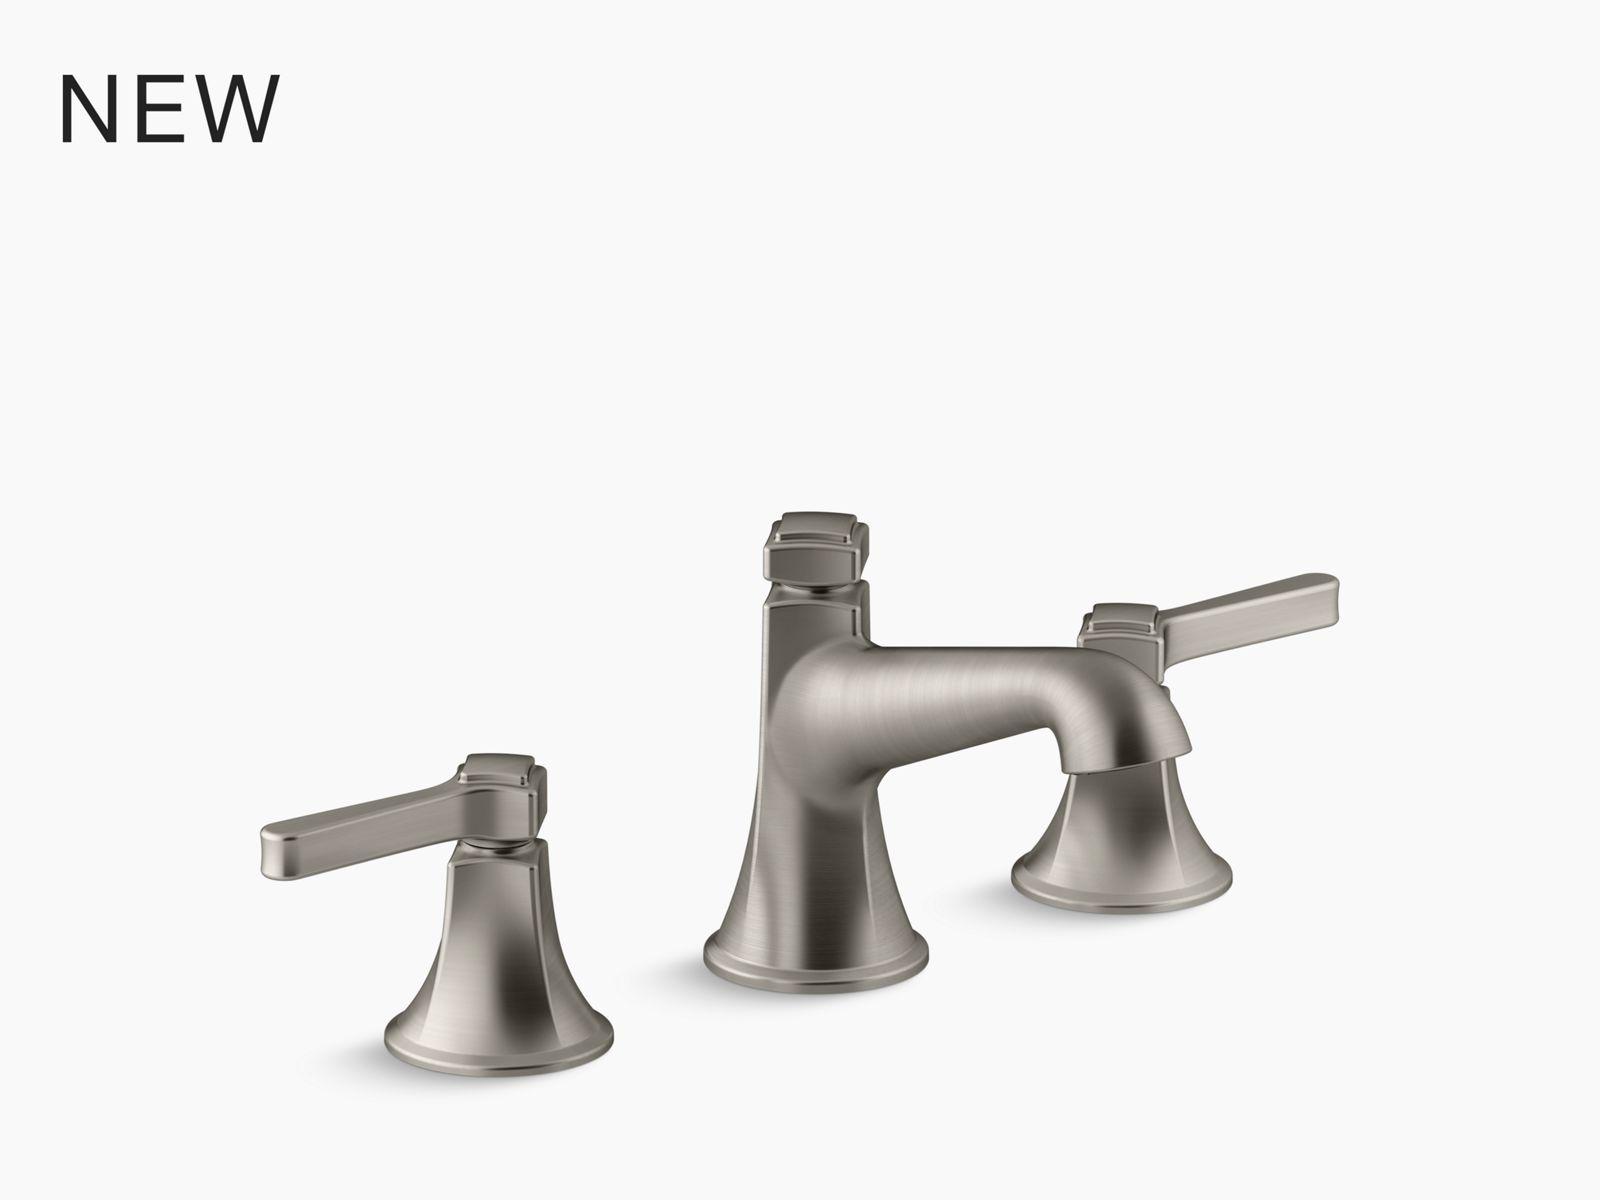 K 7272 Clearflo 1 1 2 Inch Slotted Overflow Bath Drain Kohler